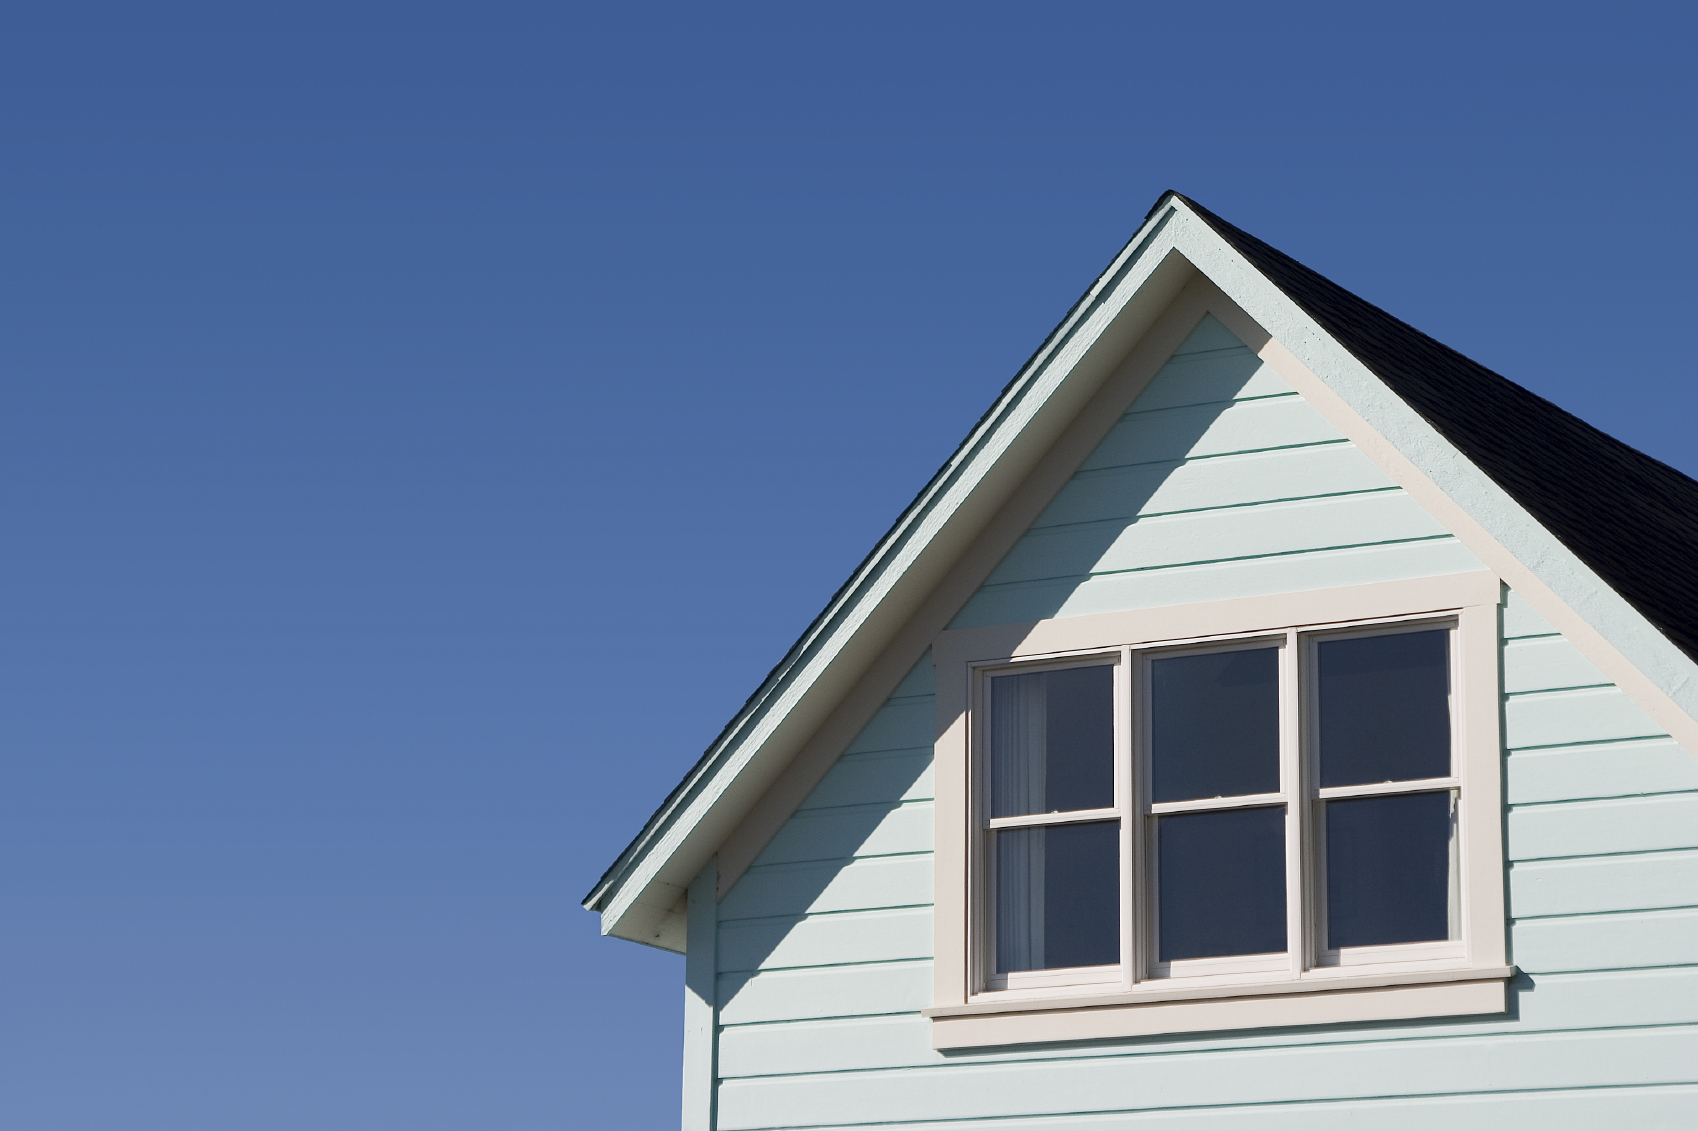 energia llc window cost insulation